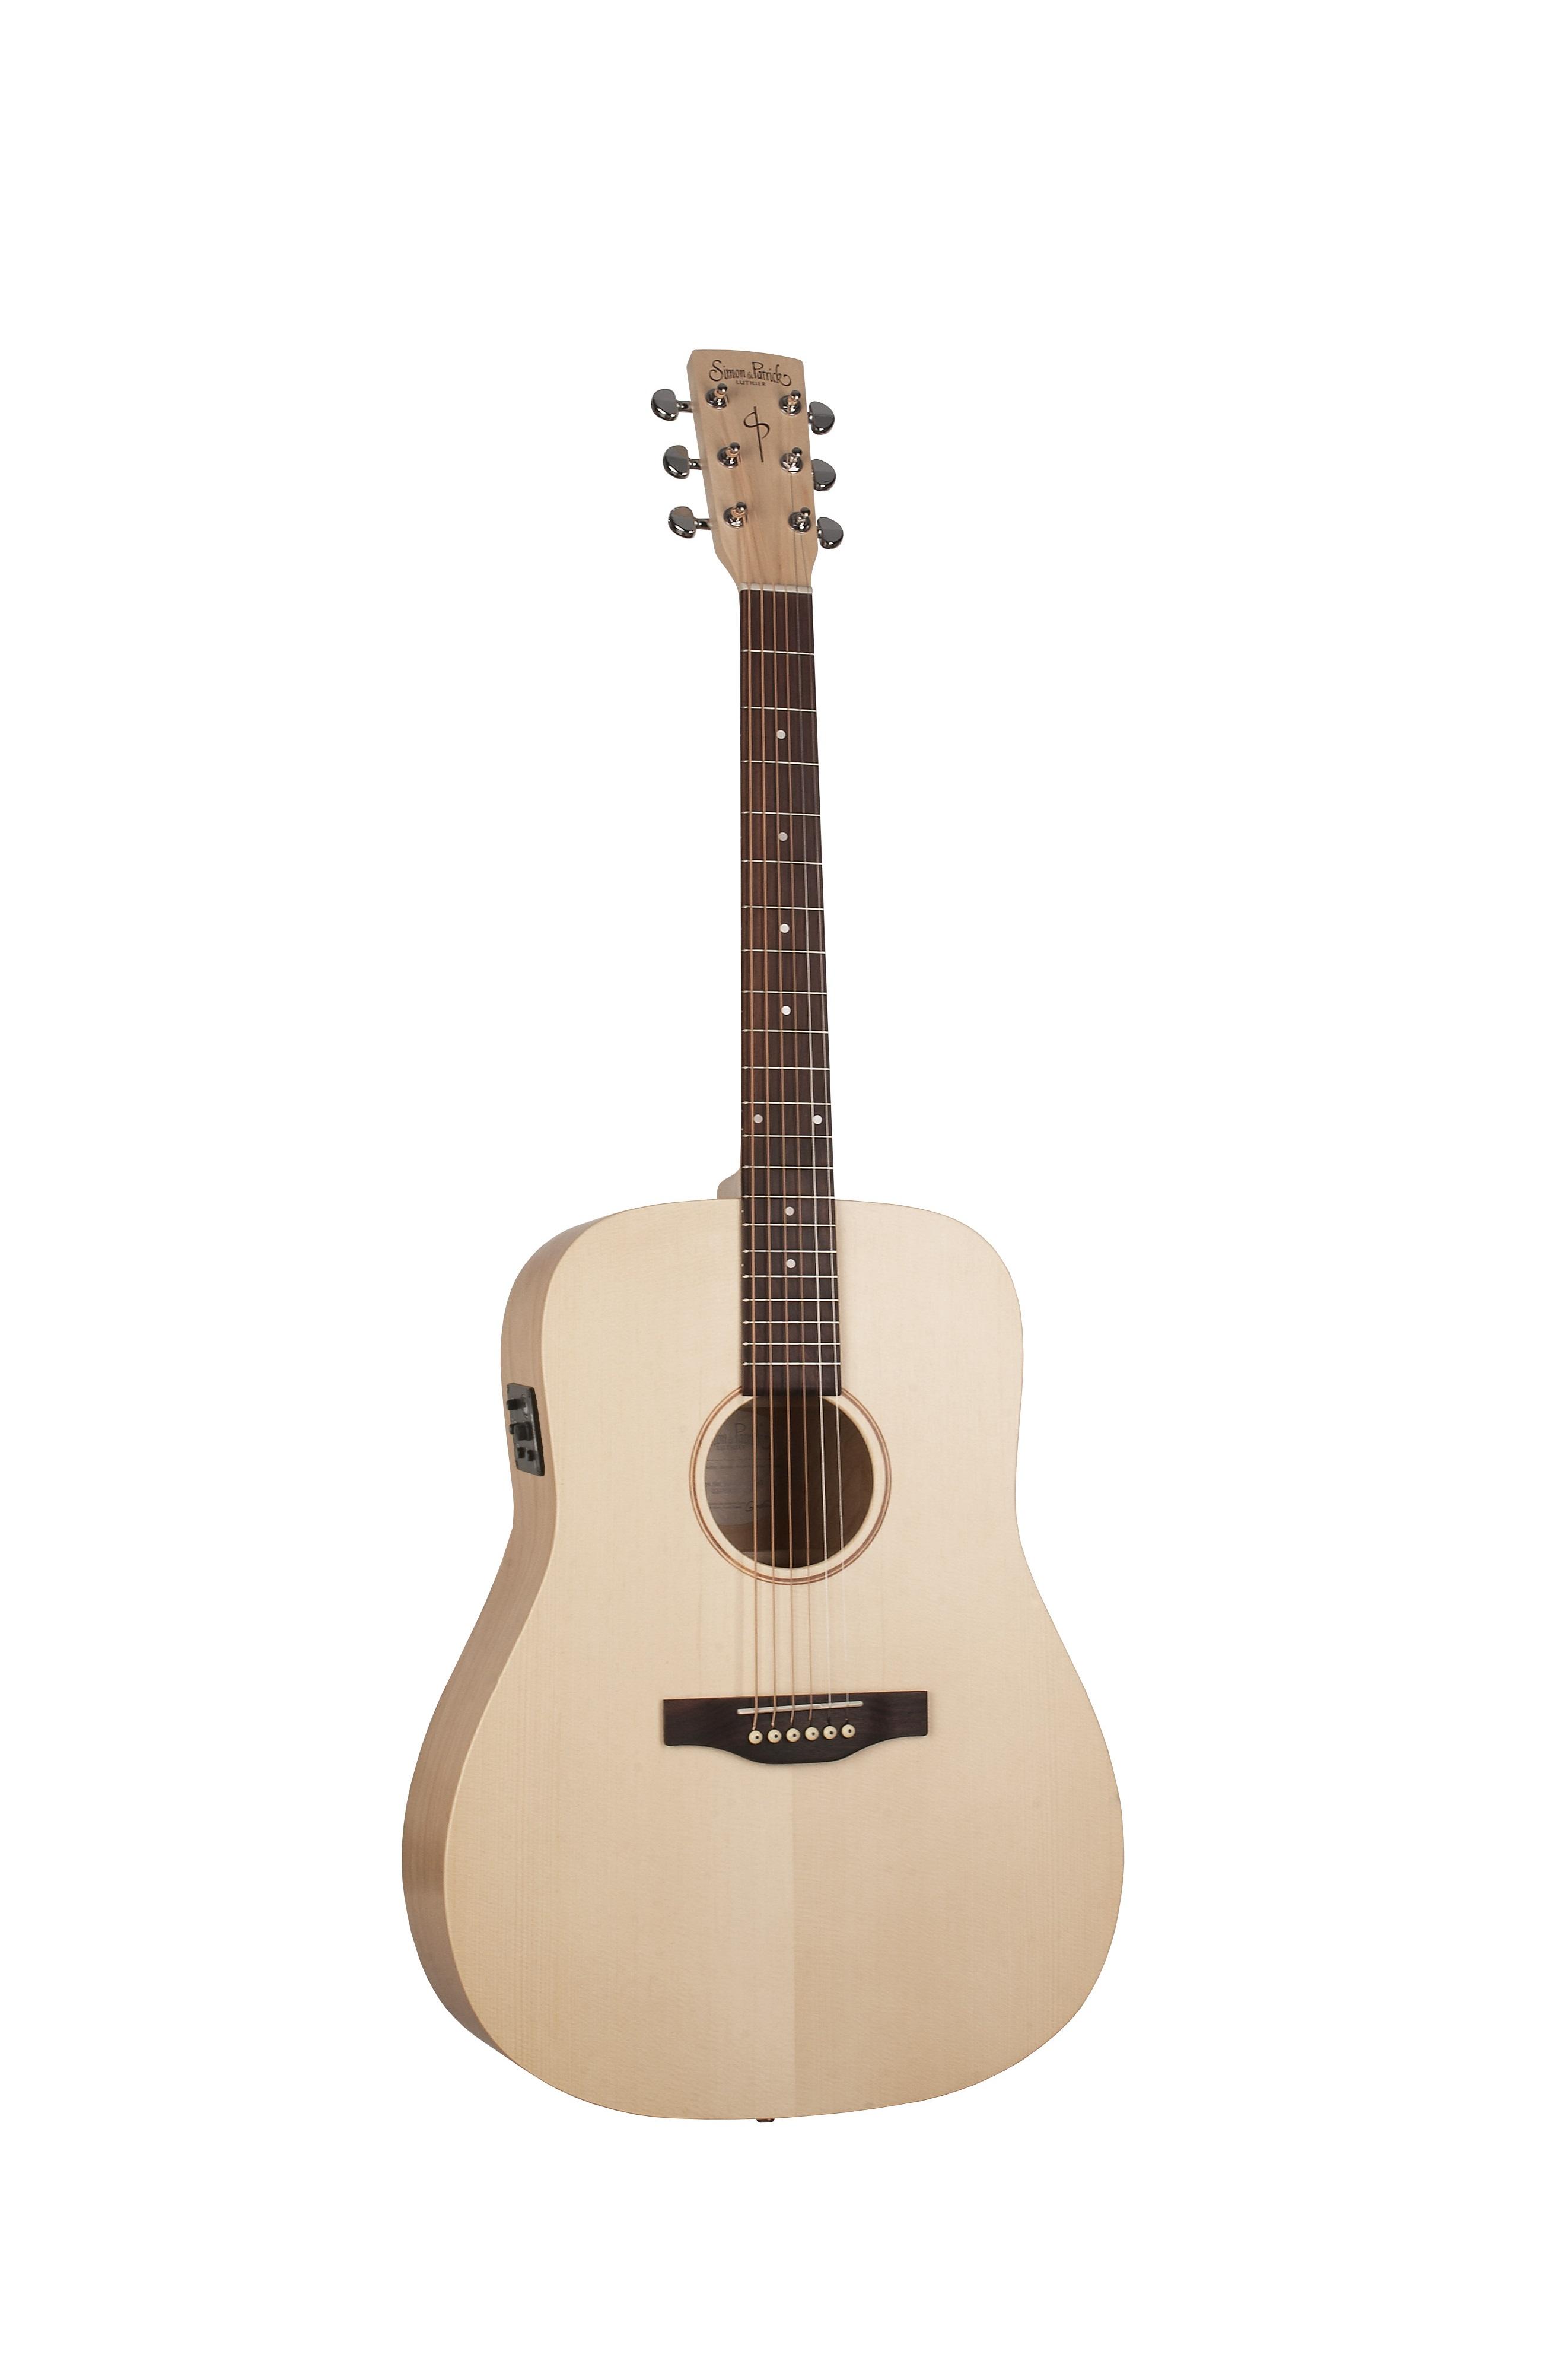 Simon & Patrick 39715 Trek Natural Spruce Dreadnought Acoustic Guitar w/ Fishman IsysT